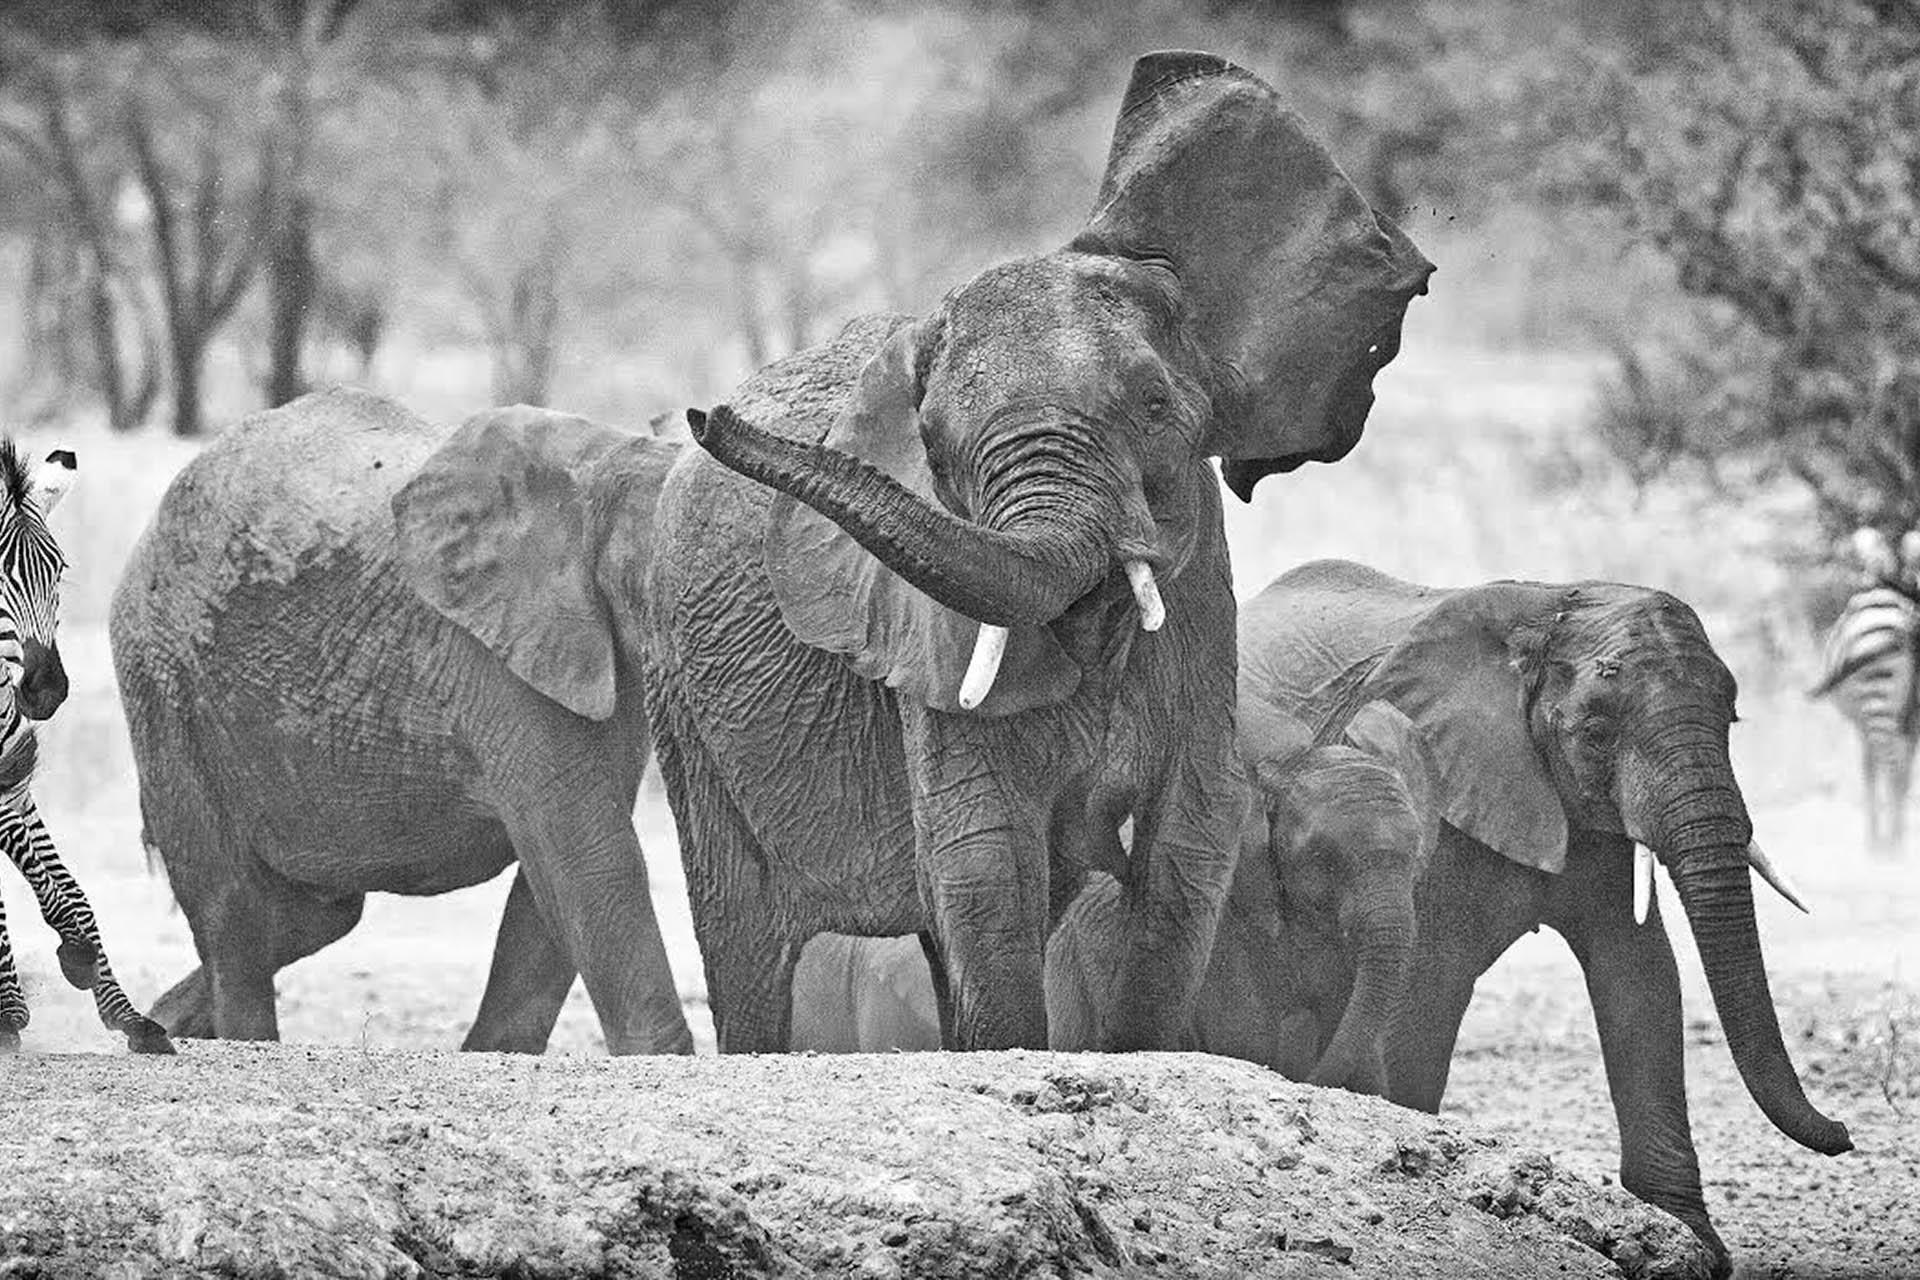 m-m-photo-tours-inc-photography-signature-photo-safaris-maasai-wanderings-africa-wildlife-elephants